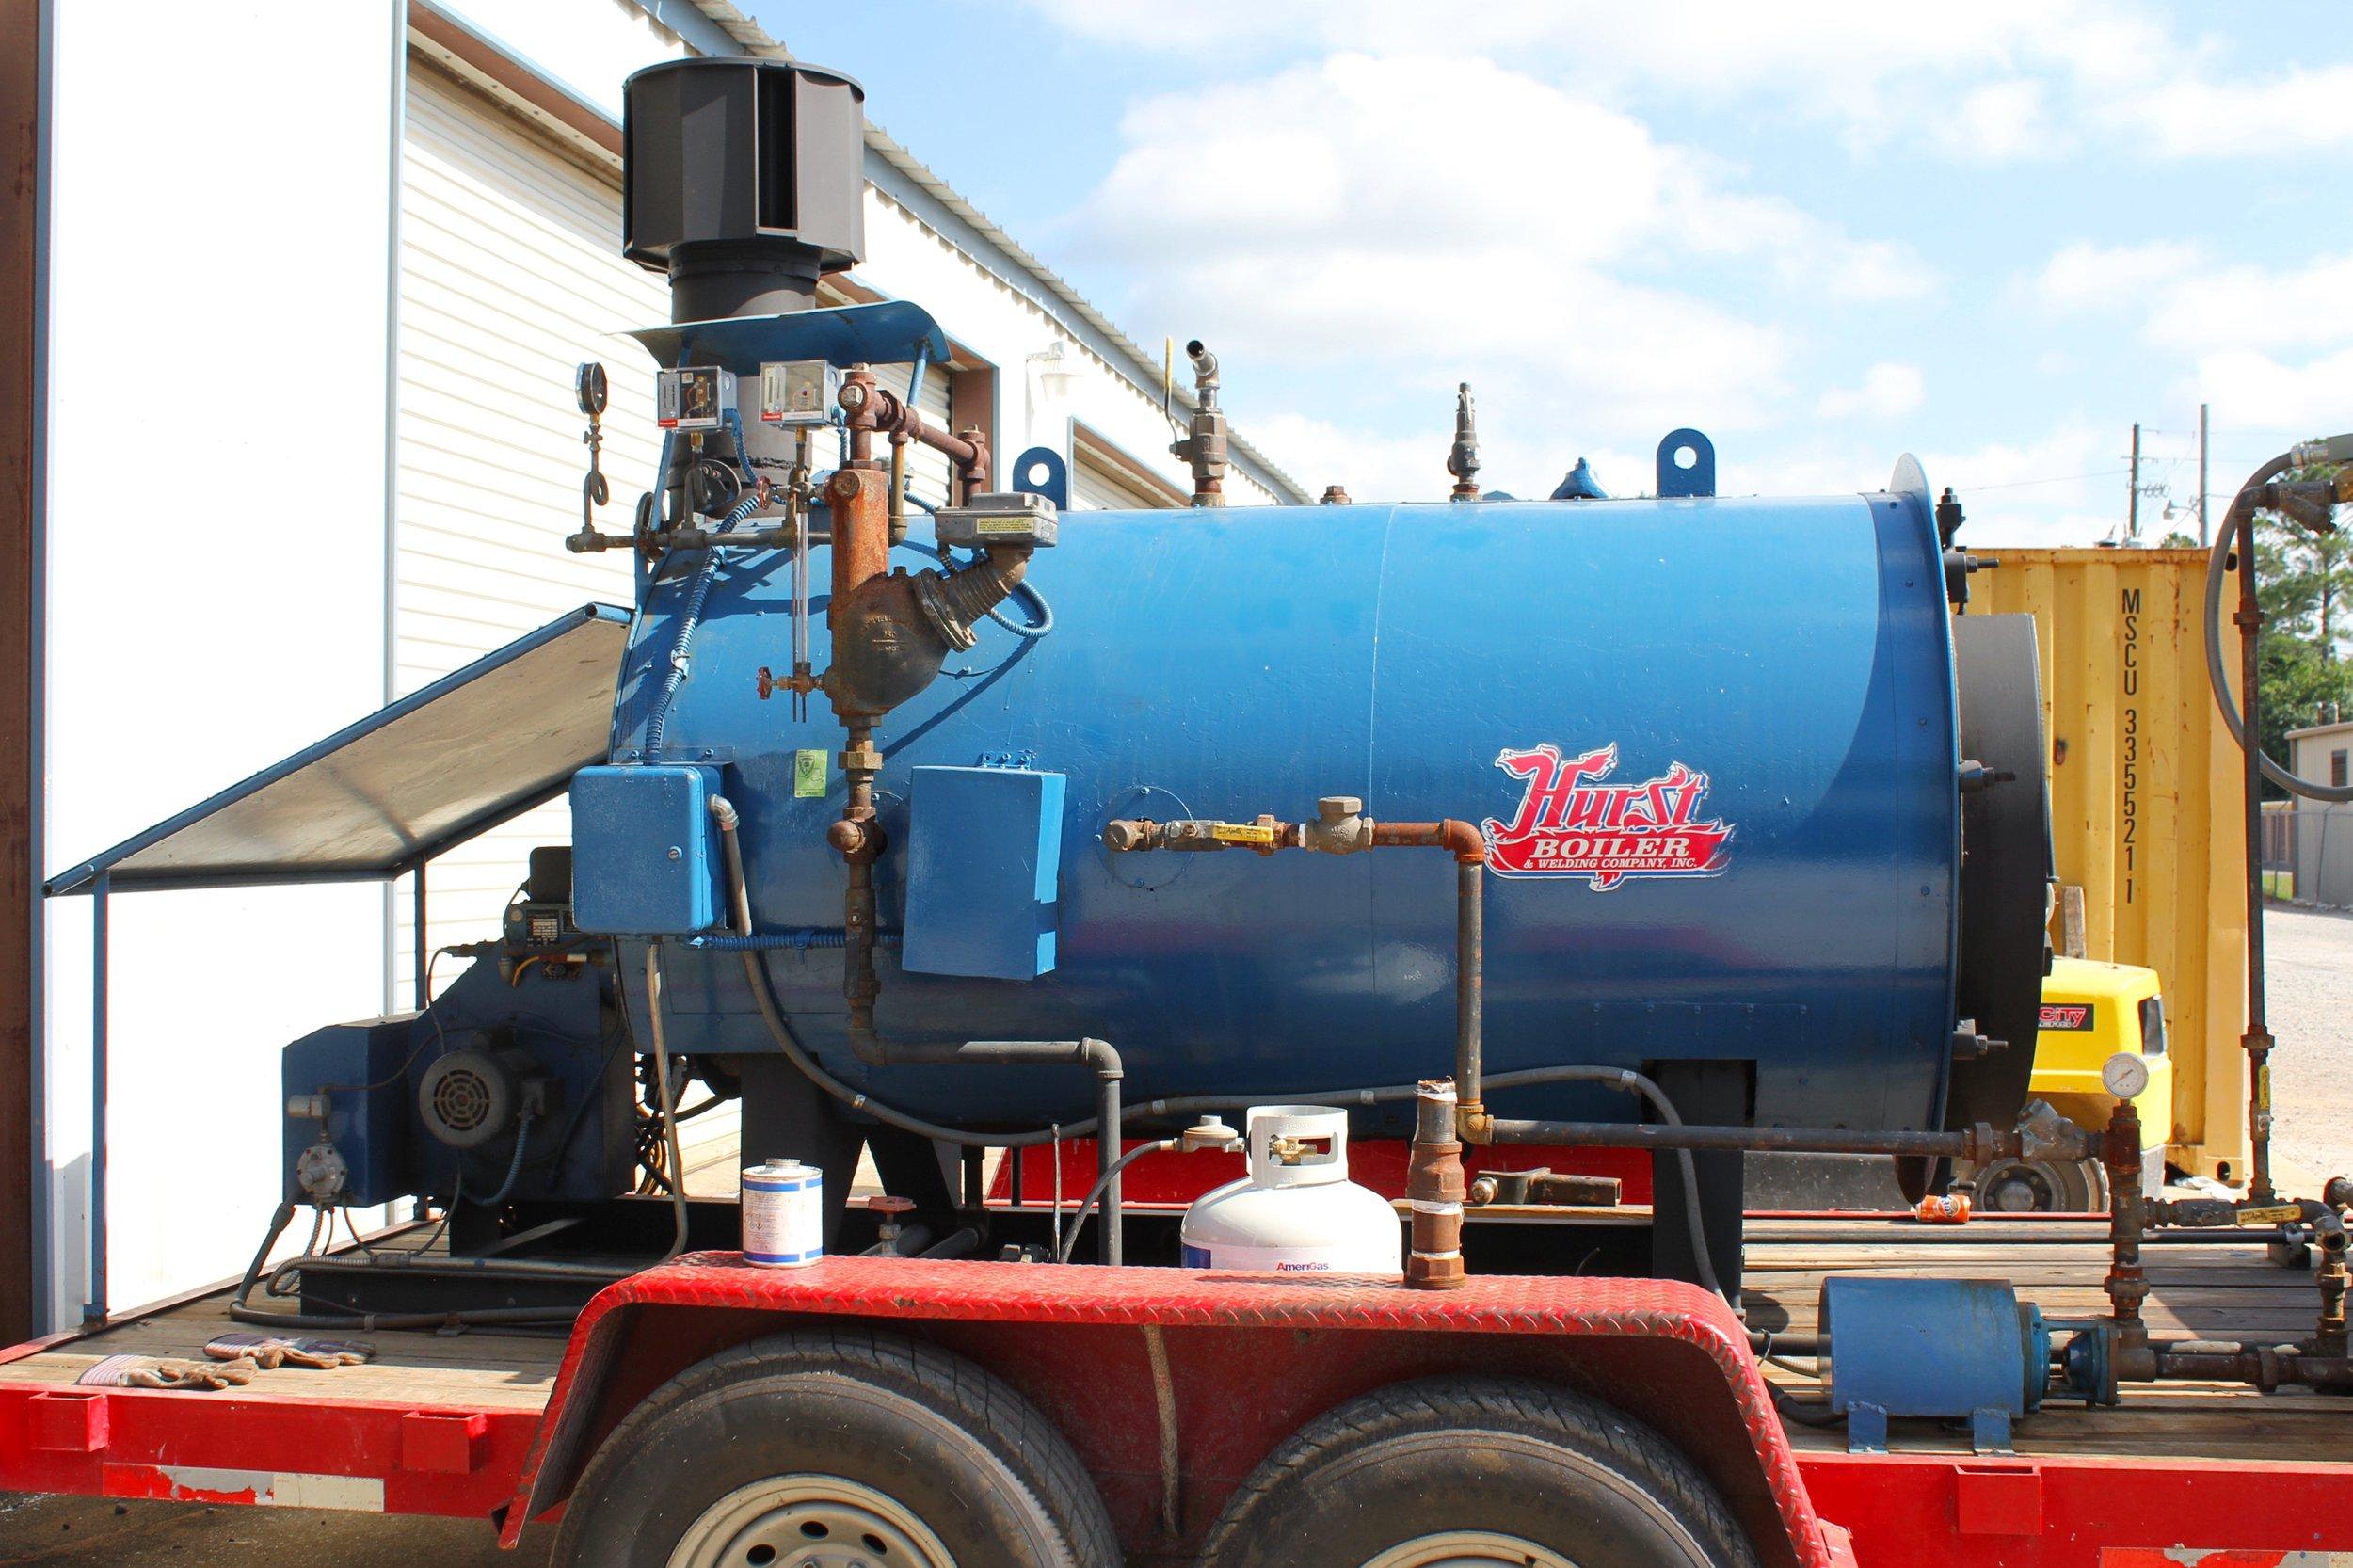 - 30 HP Hurst Firetube Scotch Marine Boiler